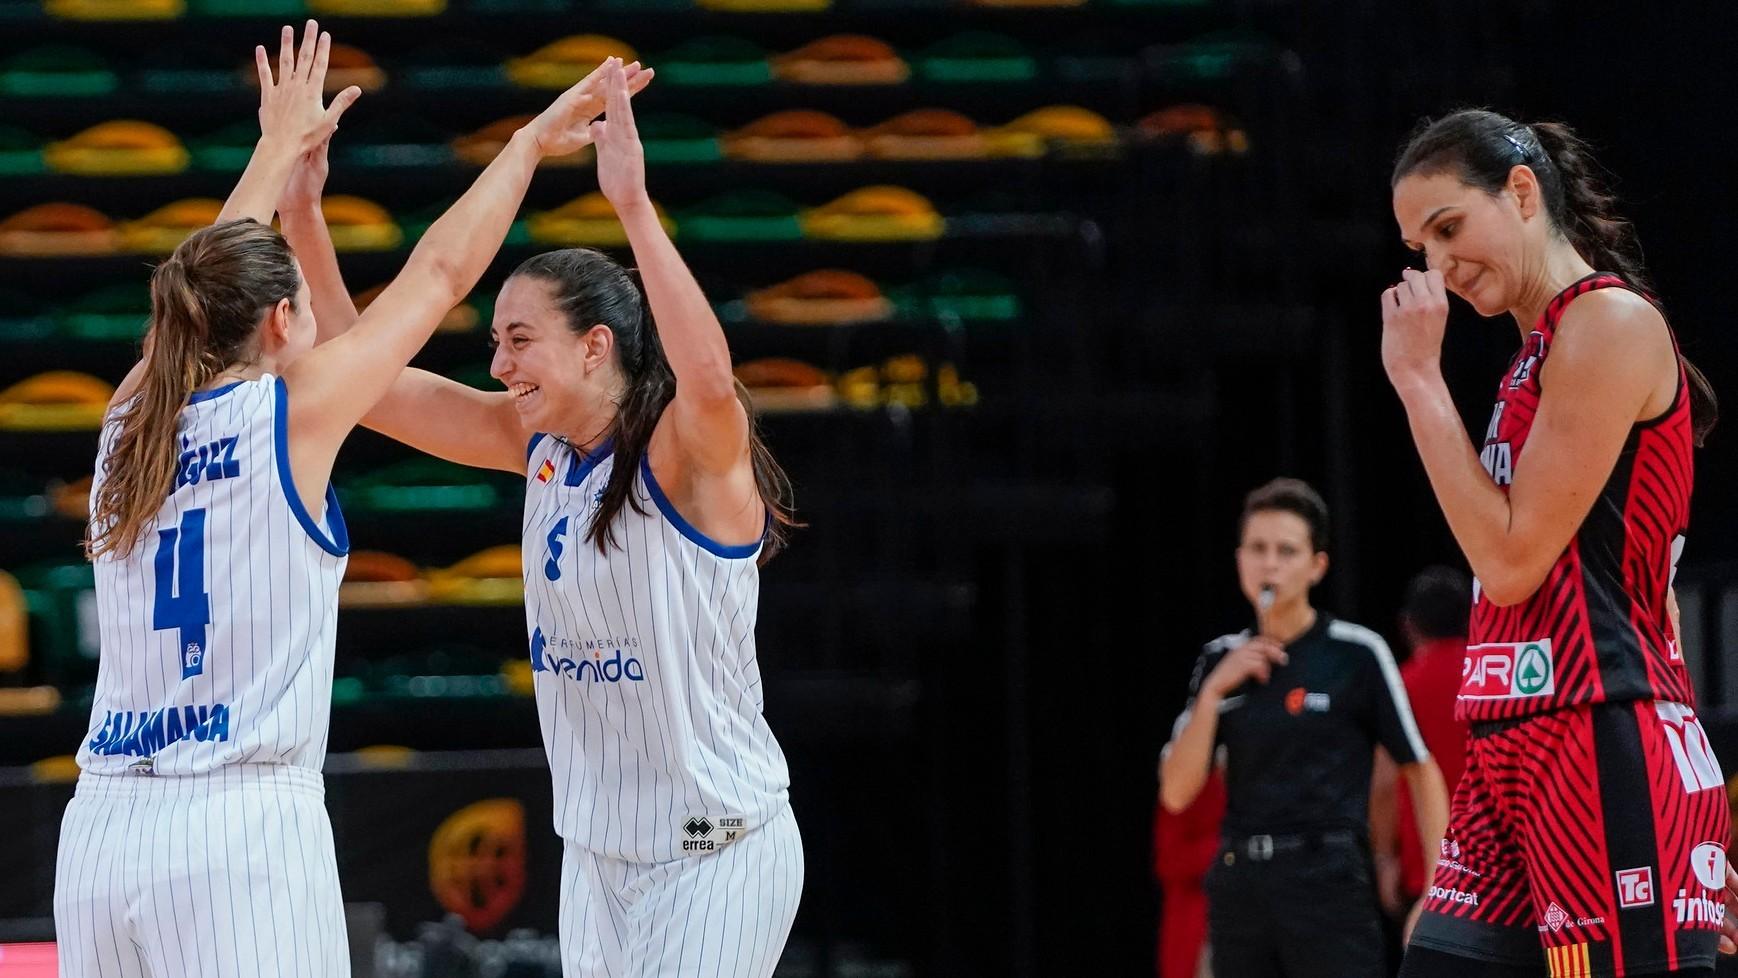 Leonor Rodríguez y Maite Cazorla celebran el triunfo ante Sonja...